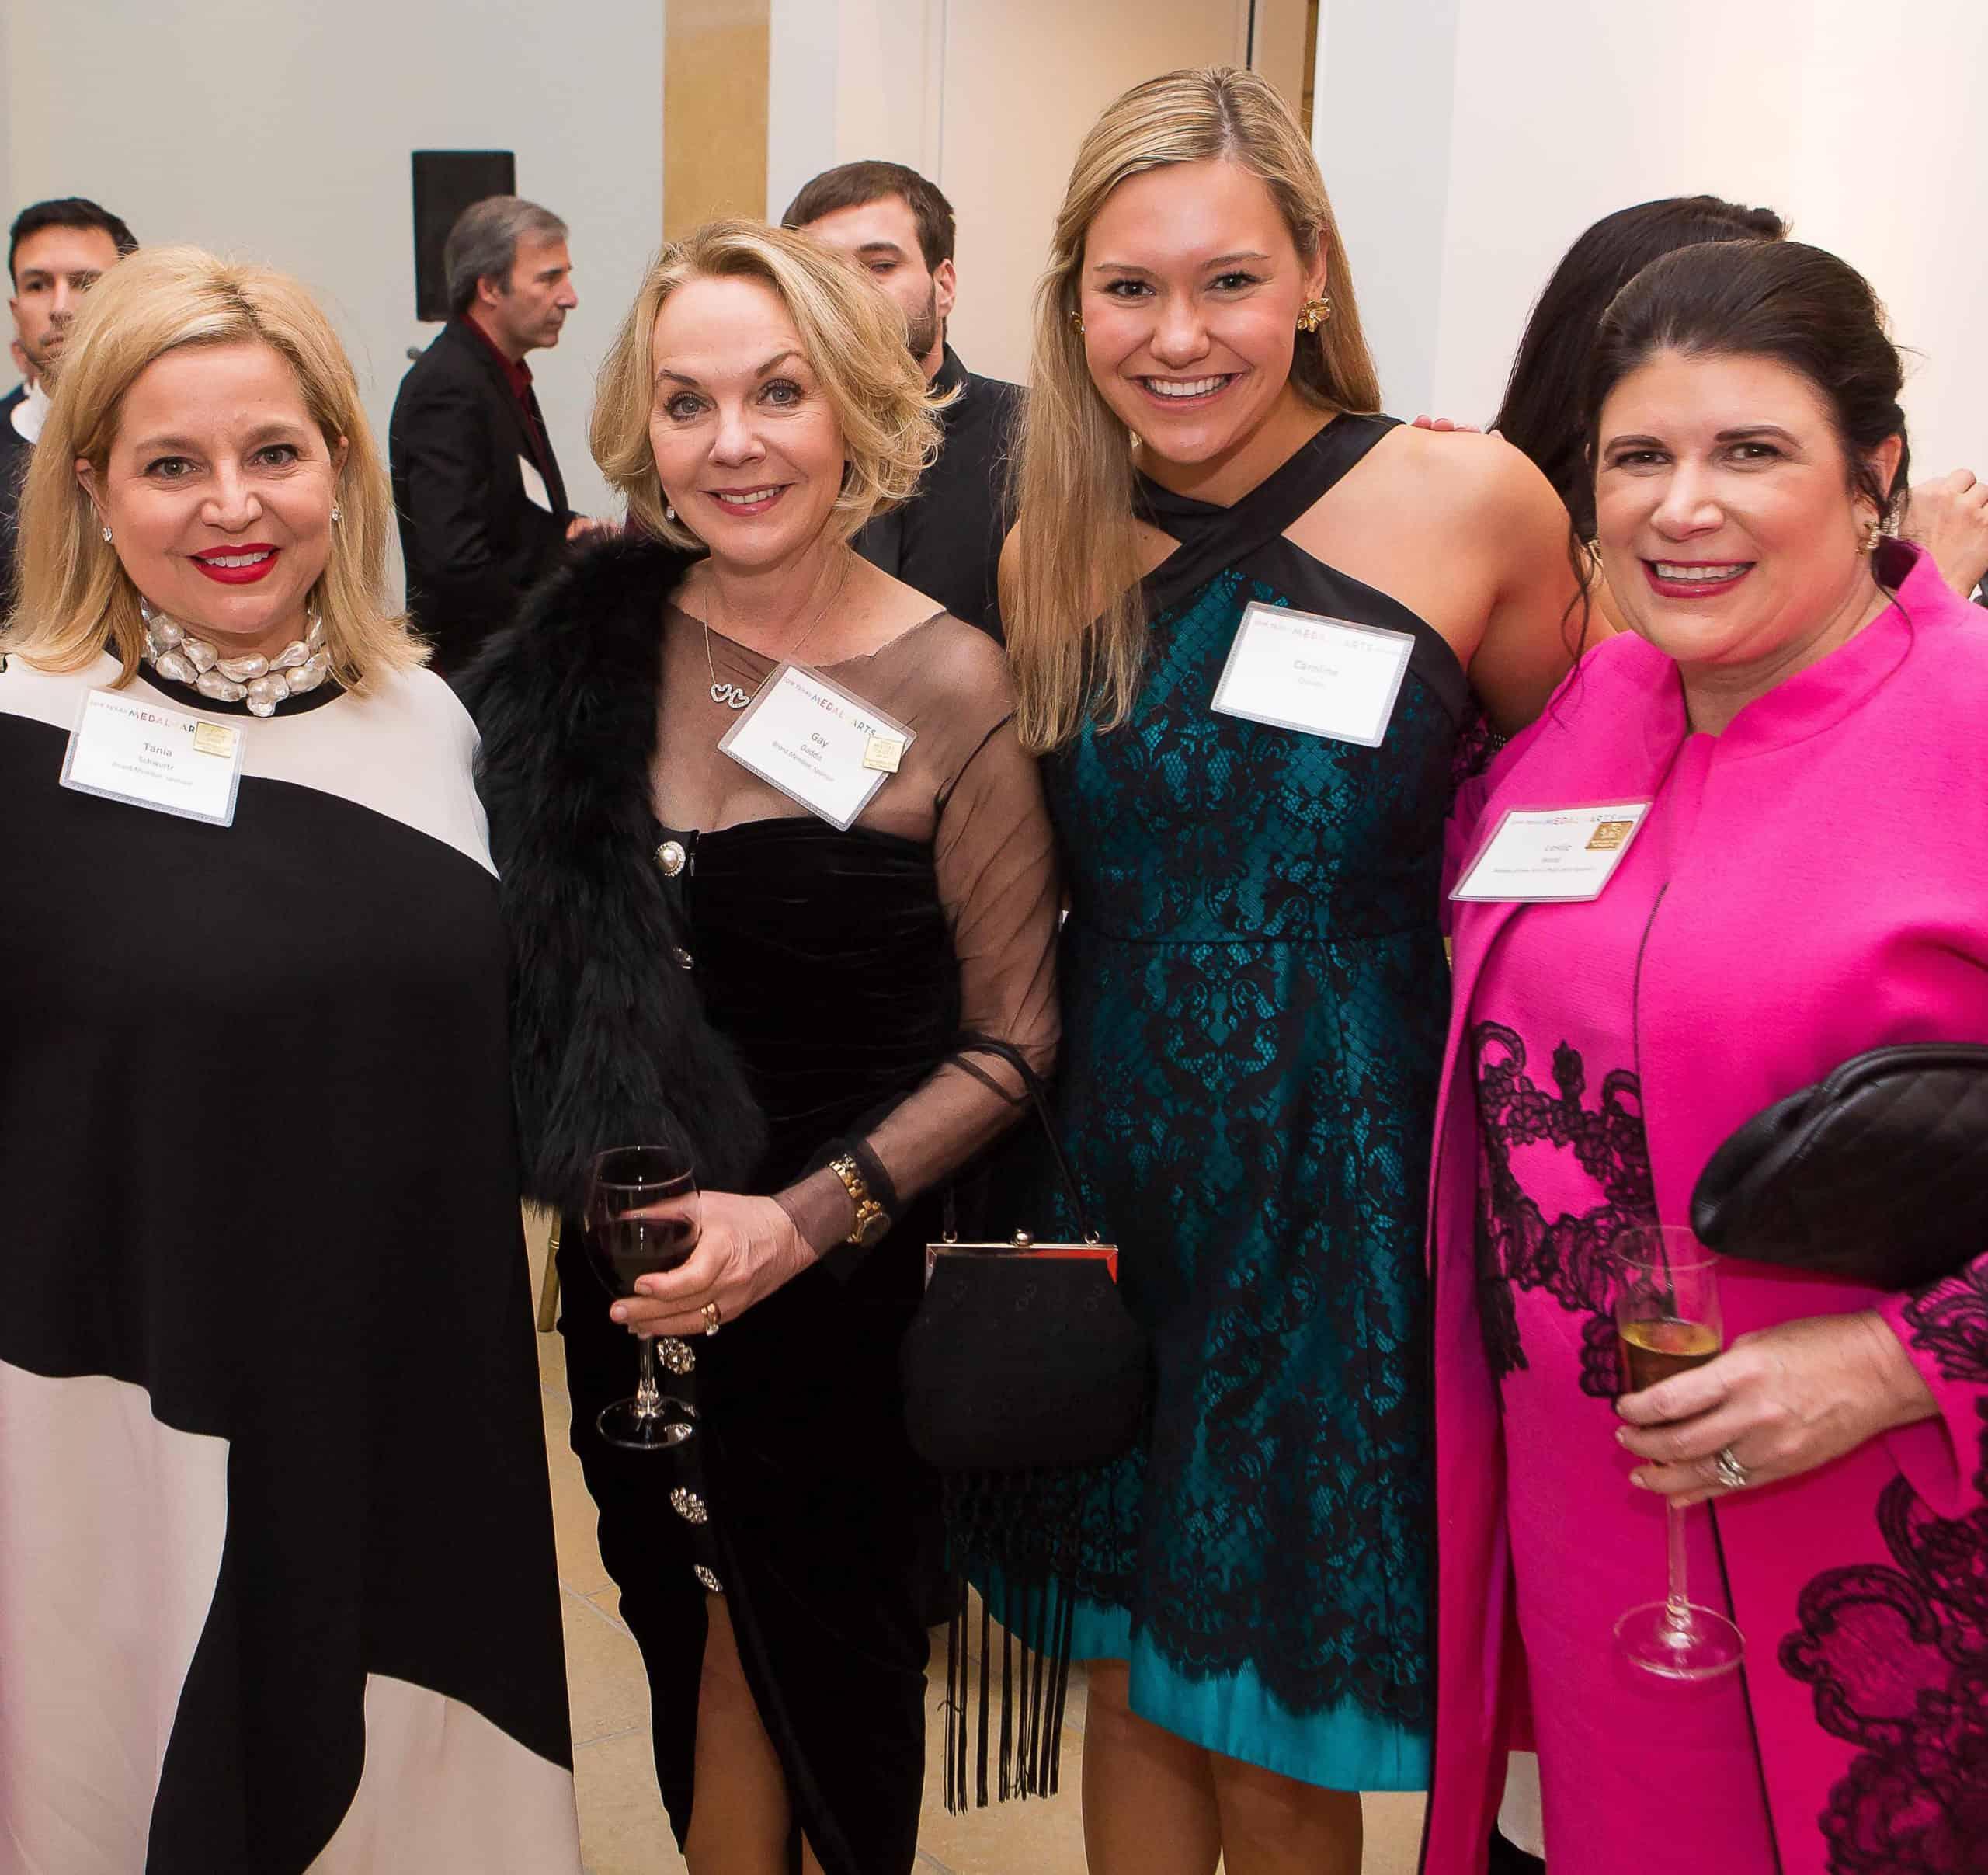 Tania Schwartz, Gay Gaddis, Caroline Craven and Leslie Ward